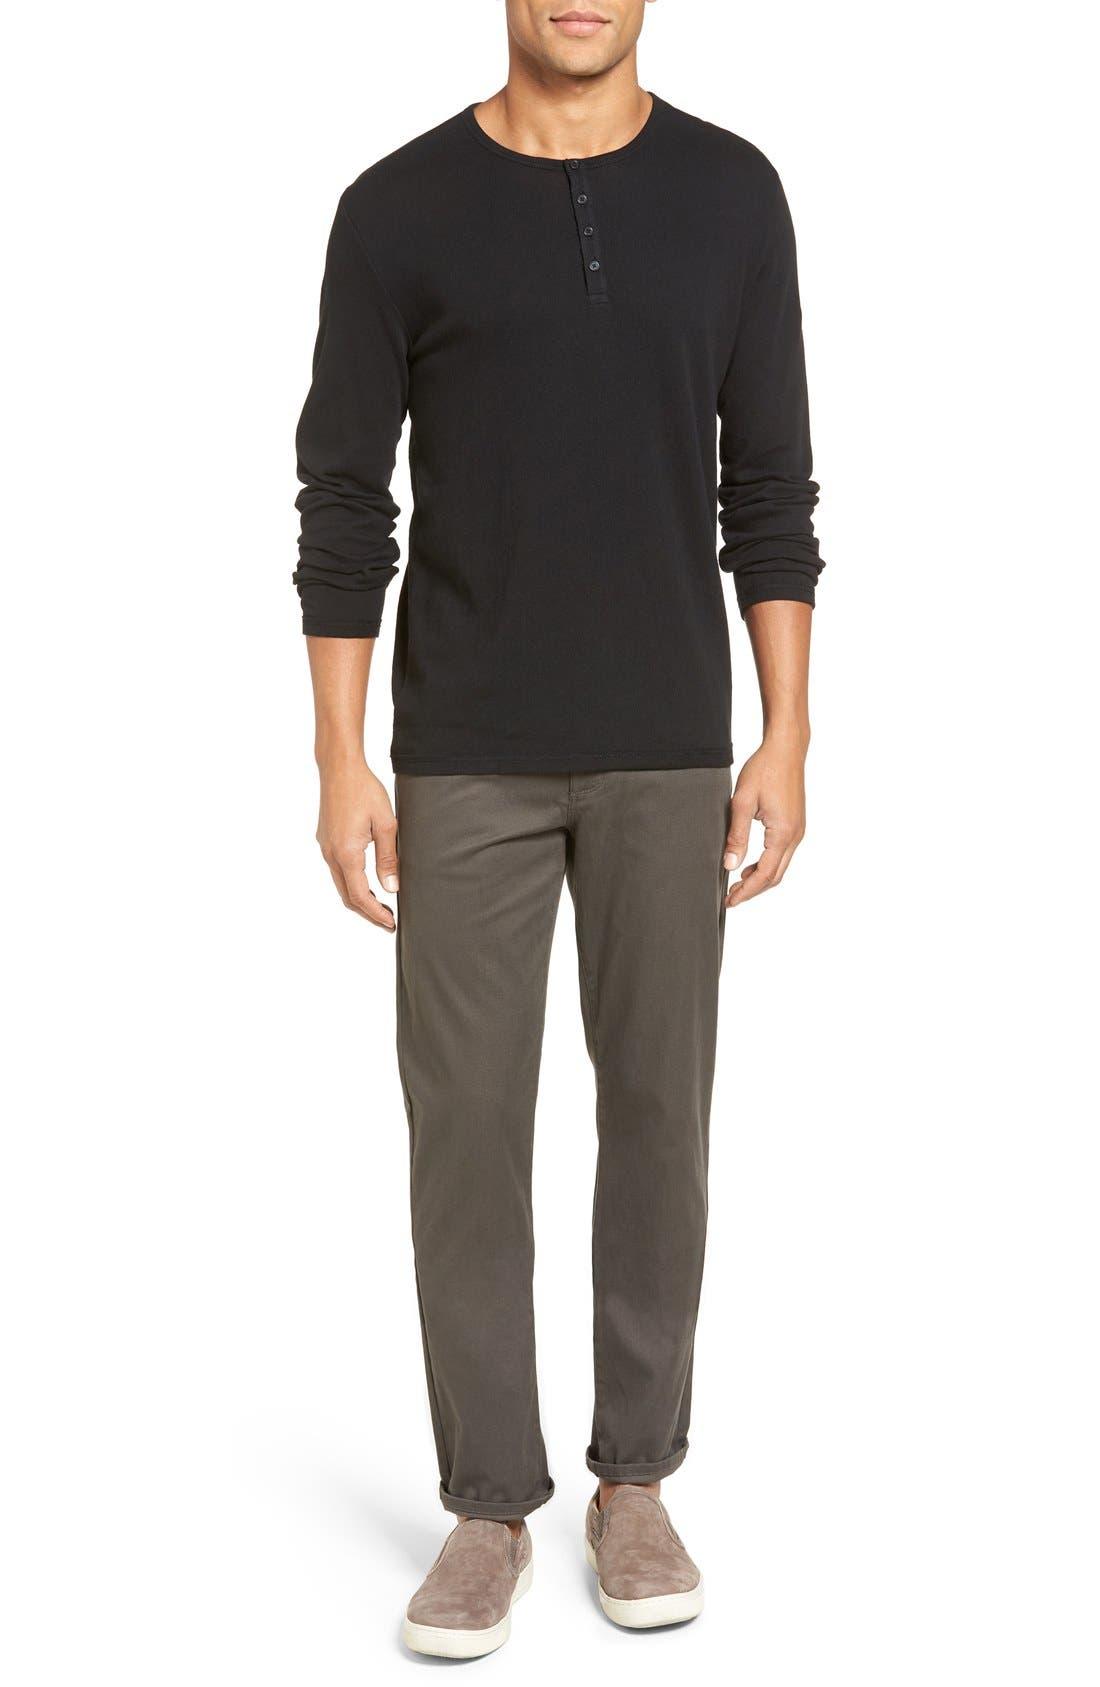 Soho Slim Fit Five-Pocket Pants,                             Alternate thumbnail 7, color,                             GREY